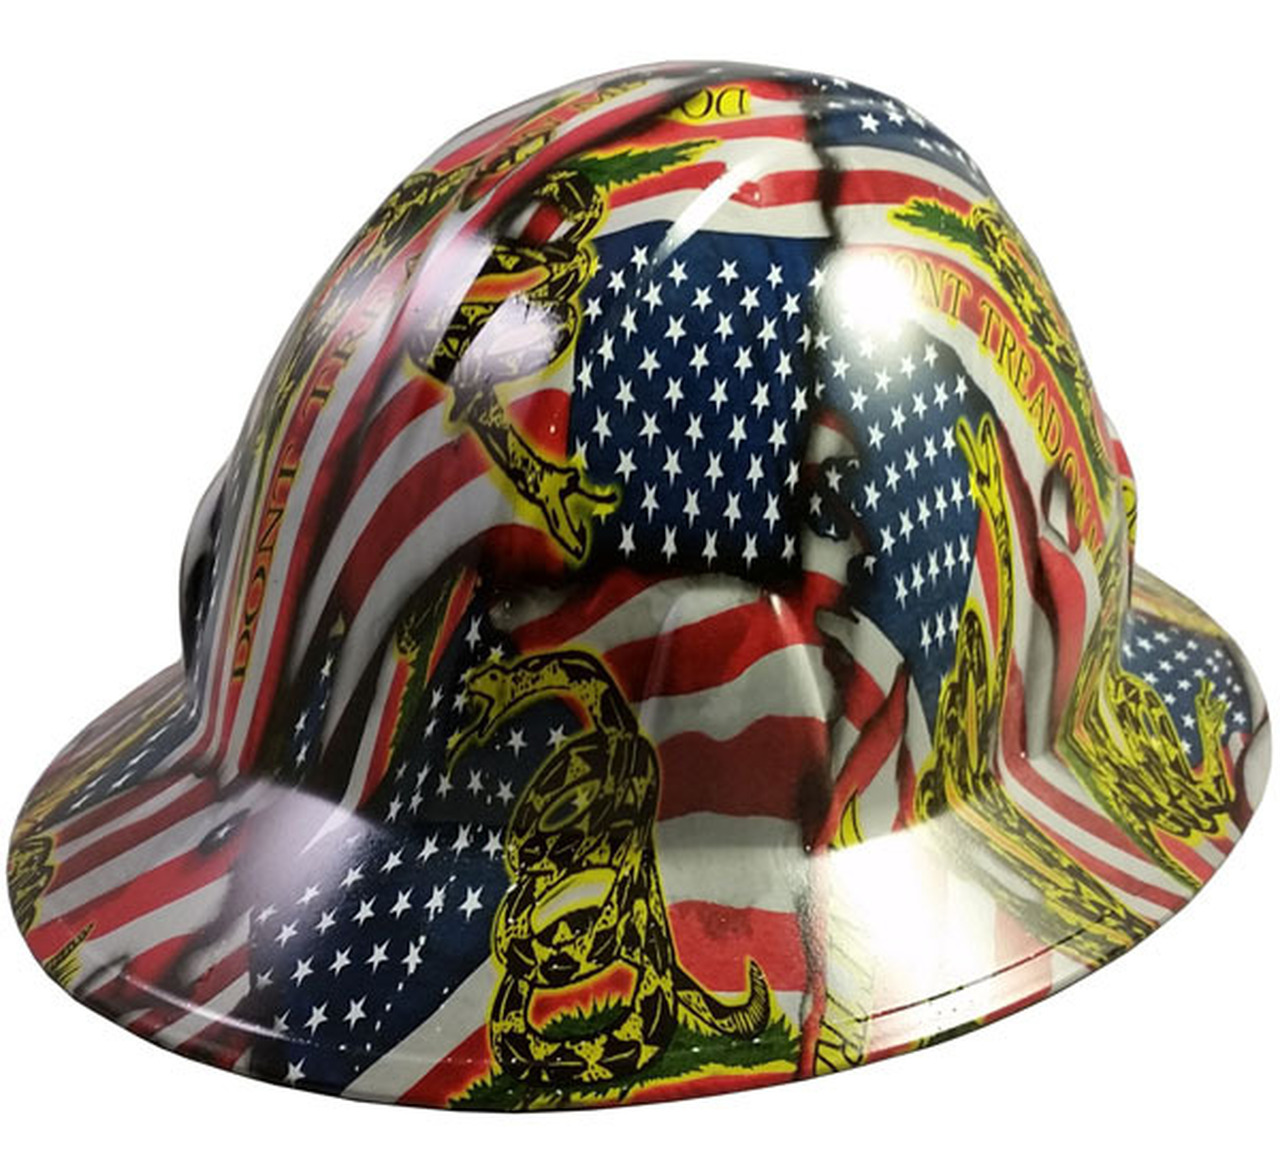 hydrographic full brim hard hat ratchet suspension don t tread on me us flag